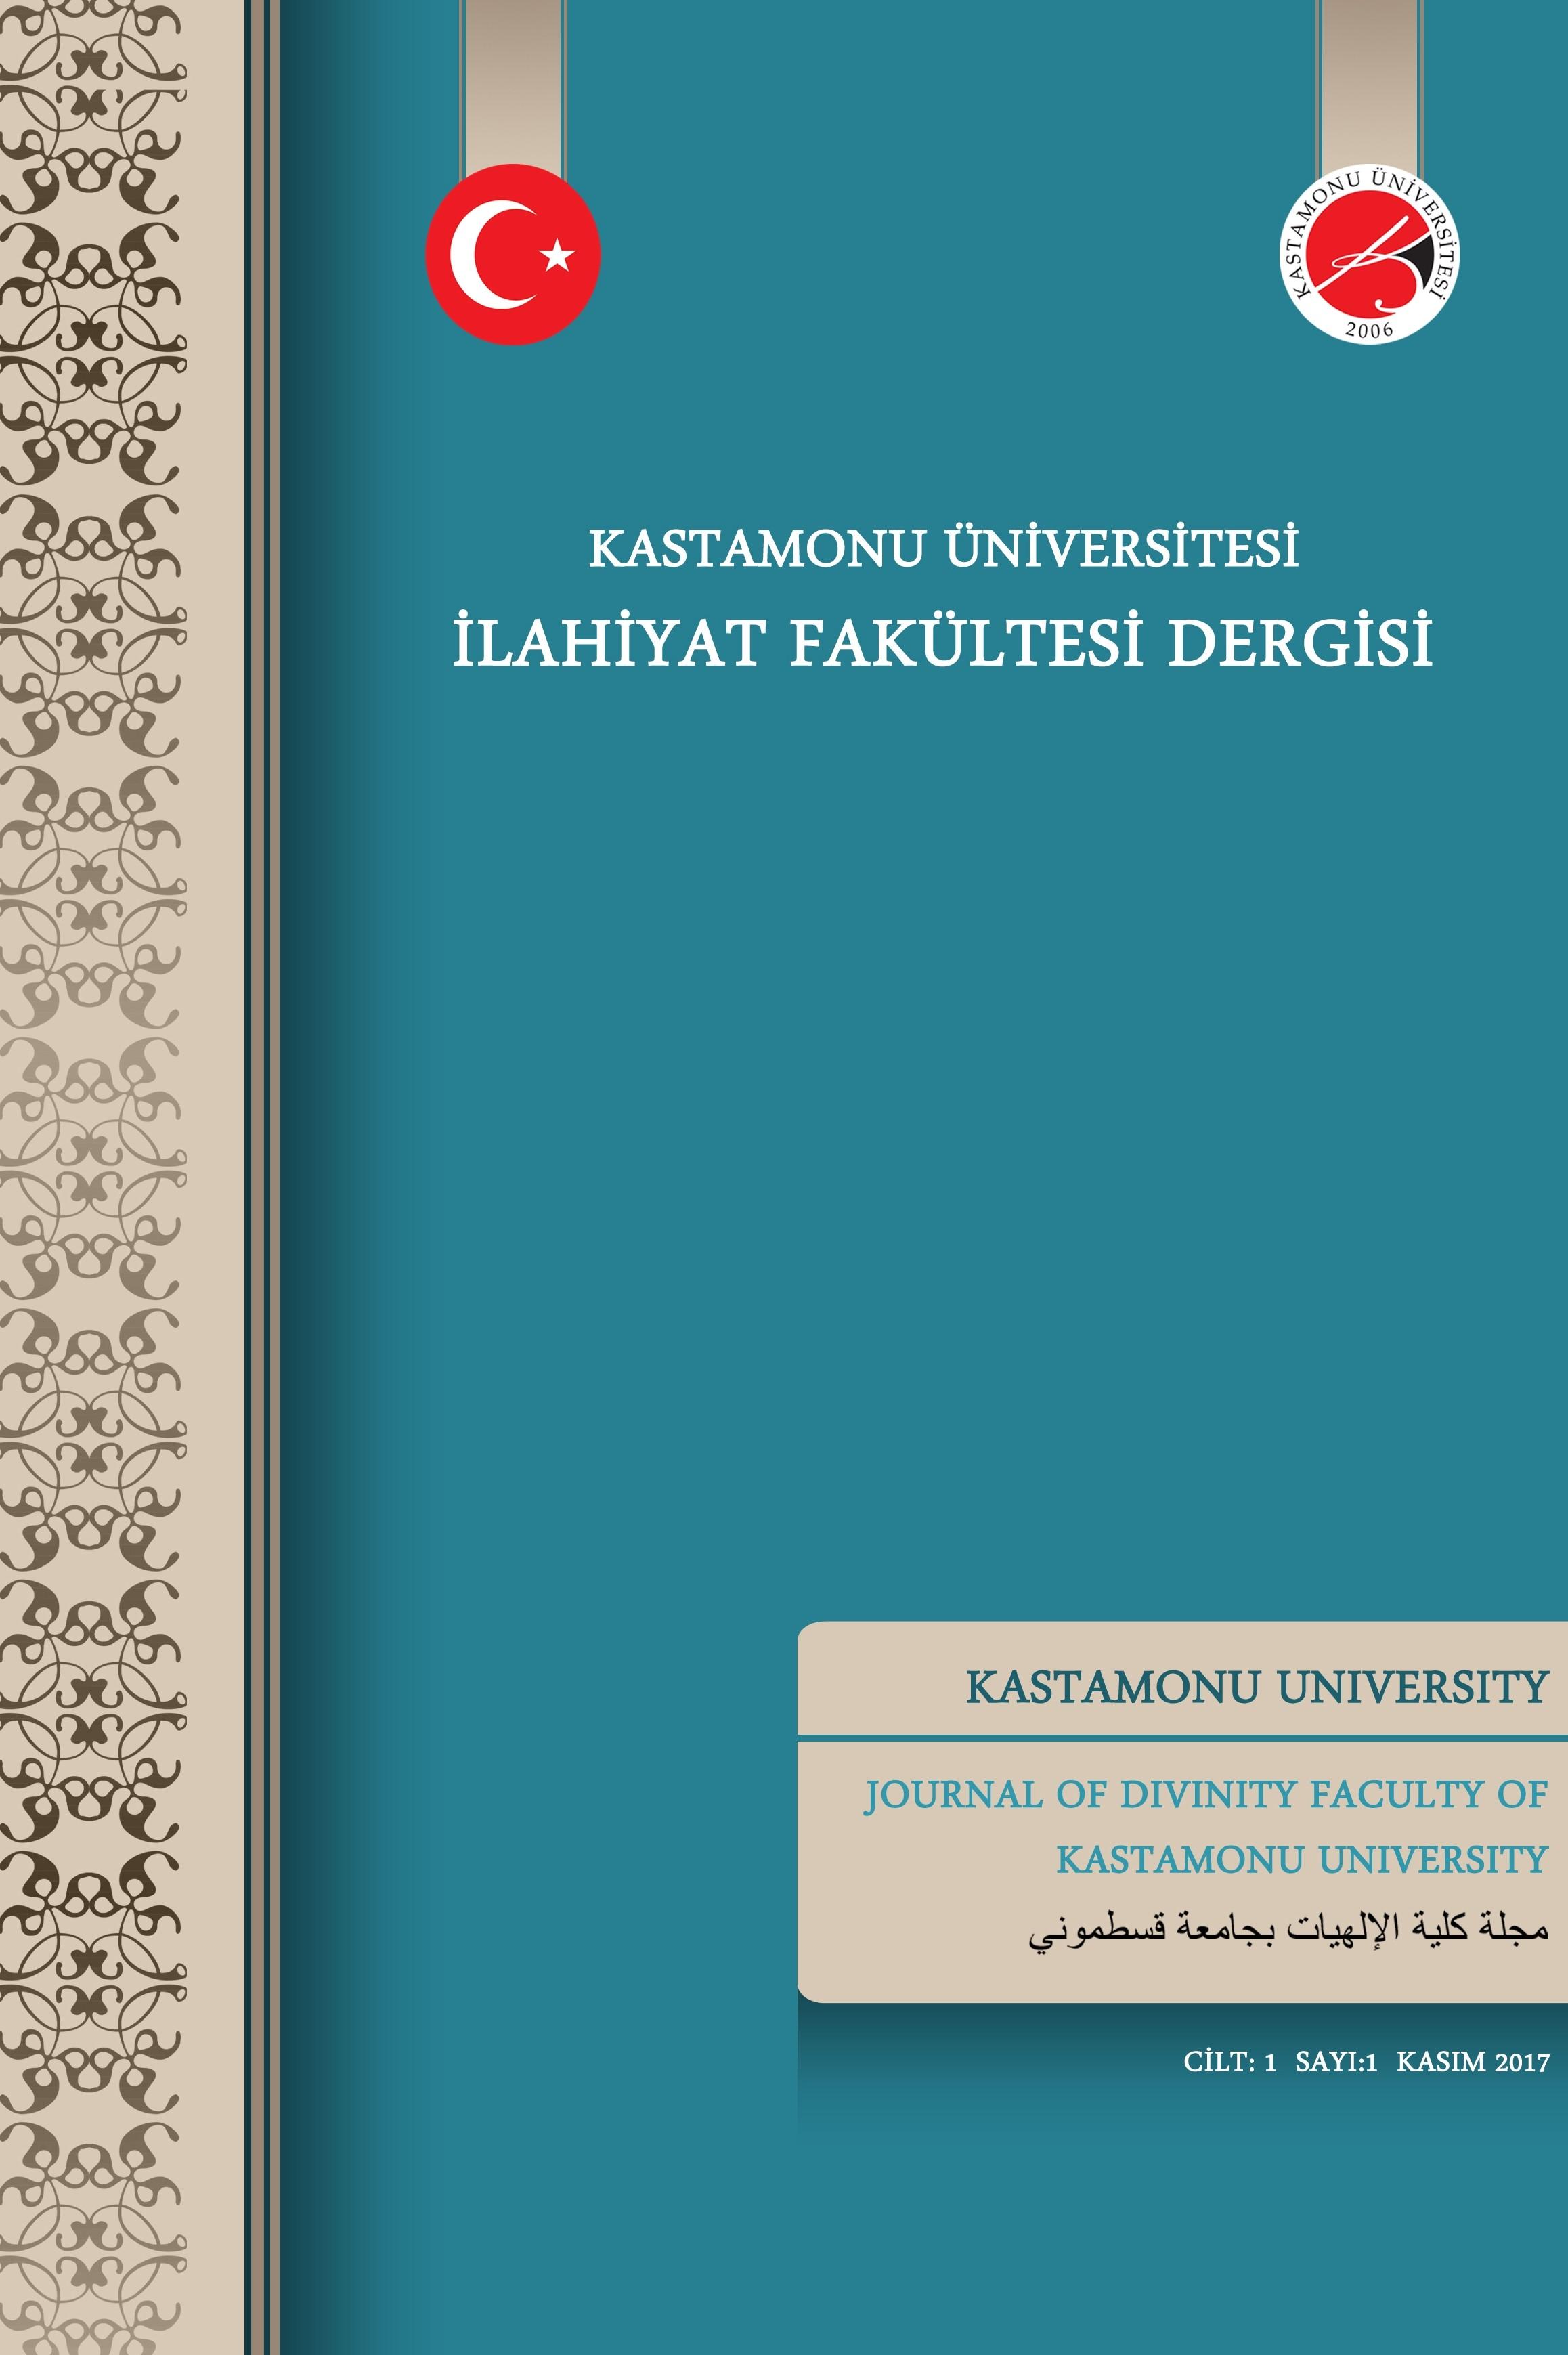 Kastamonu Üniversitesi İlahiyat Fakültesi Dergisi